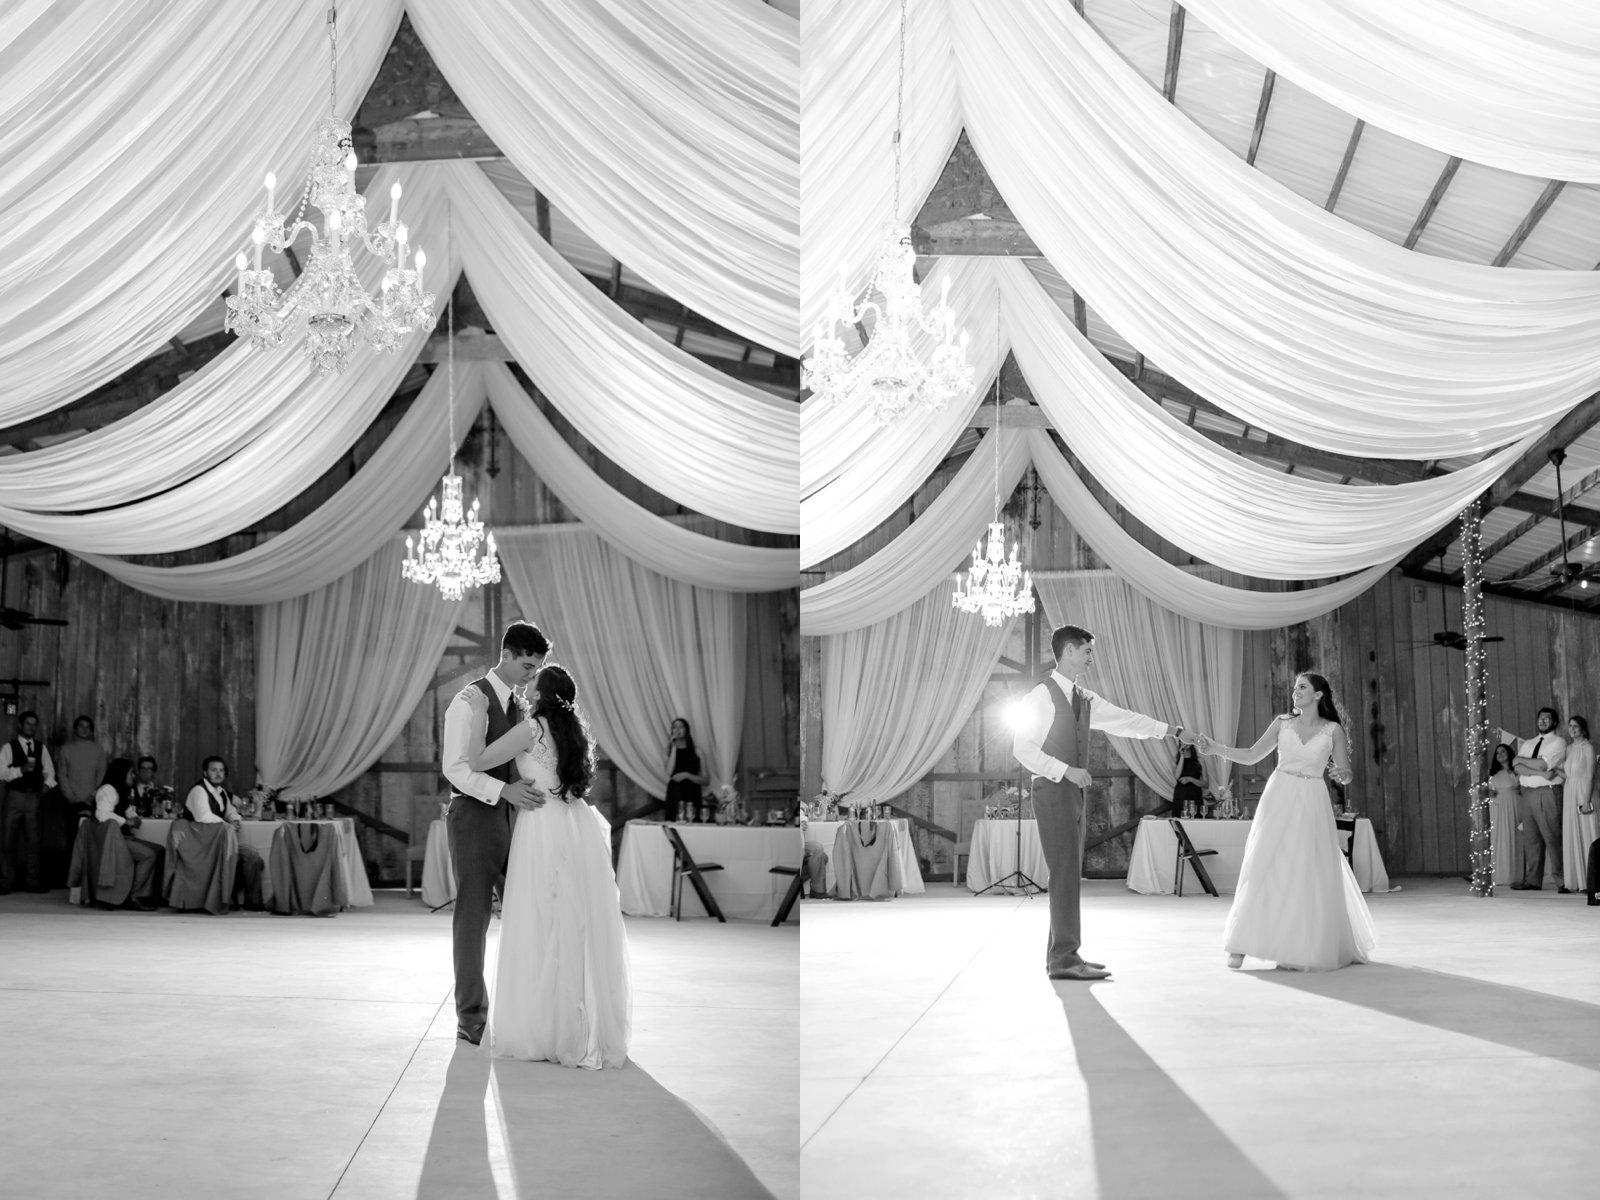 wedding_photographer_Missouri_Destination_elope_intimate_Saint_James_MO_Missouri_KansasCity_Jeff_City_Jefferson_Columbia_Engagement_Photos_Pictures_Session_Best_Videographer_0189.jpg